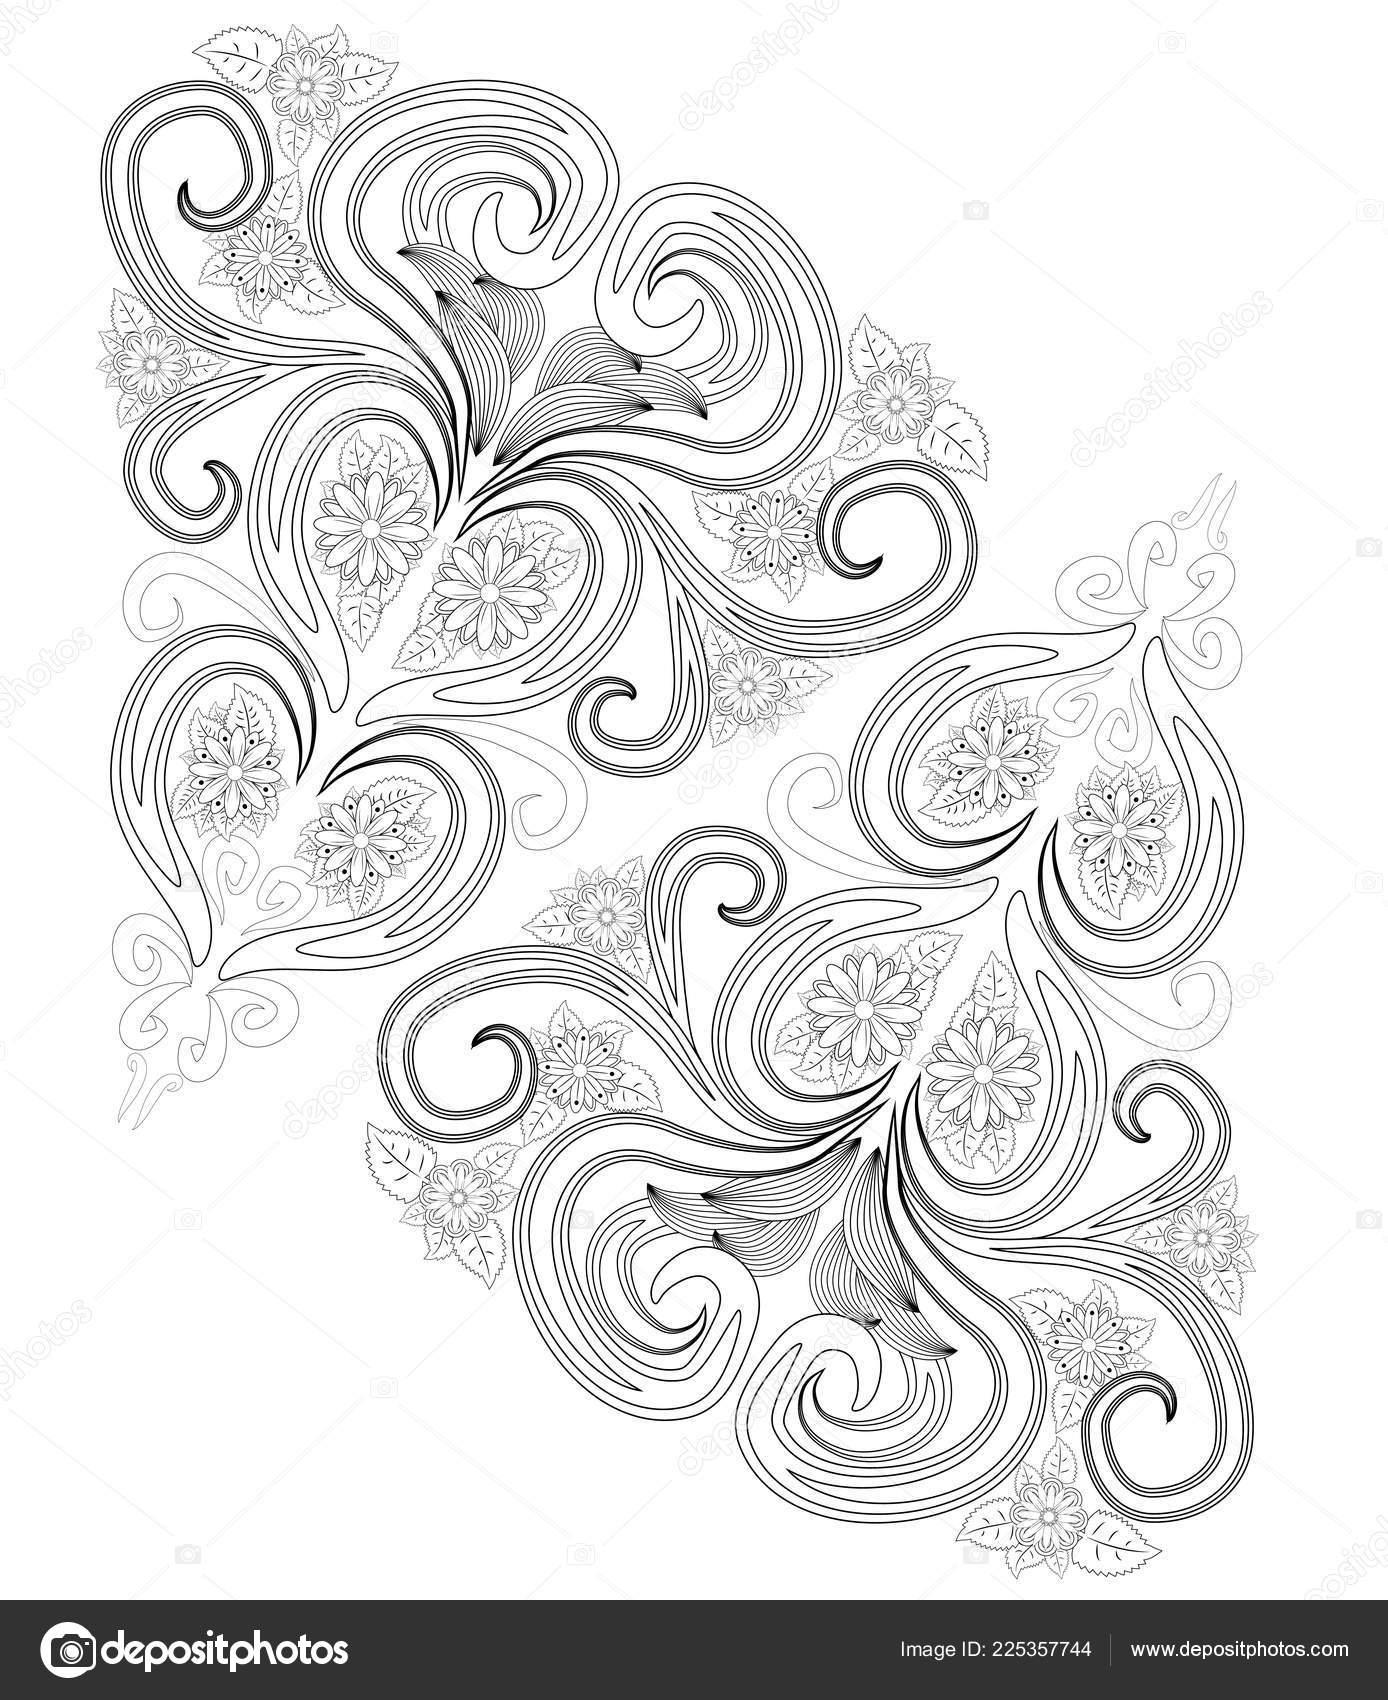 Henna Tattoo Doodle Elements White Background Mehendi Flowers Vector